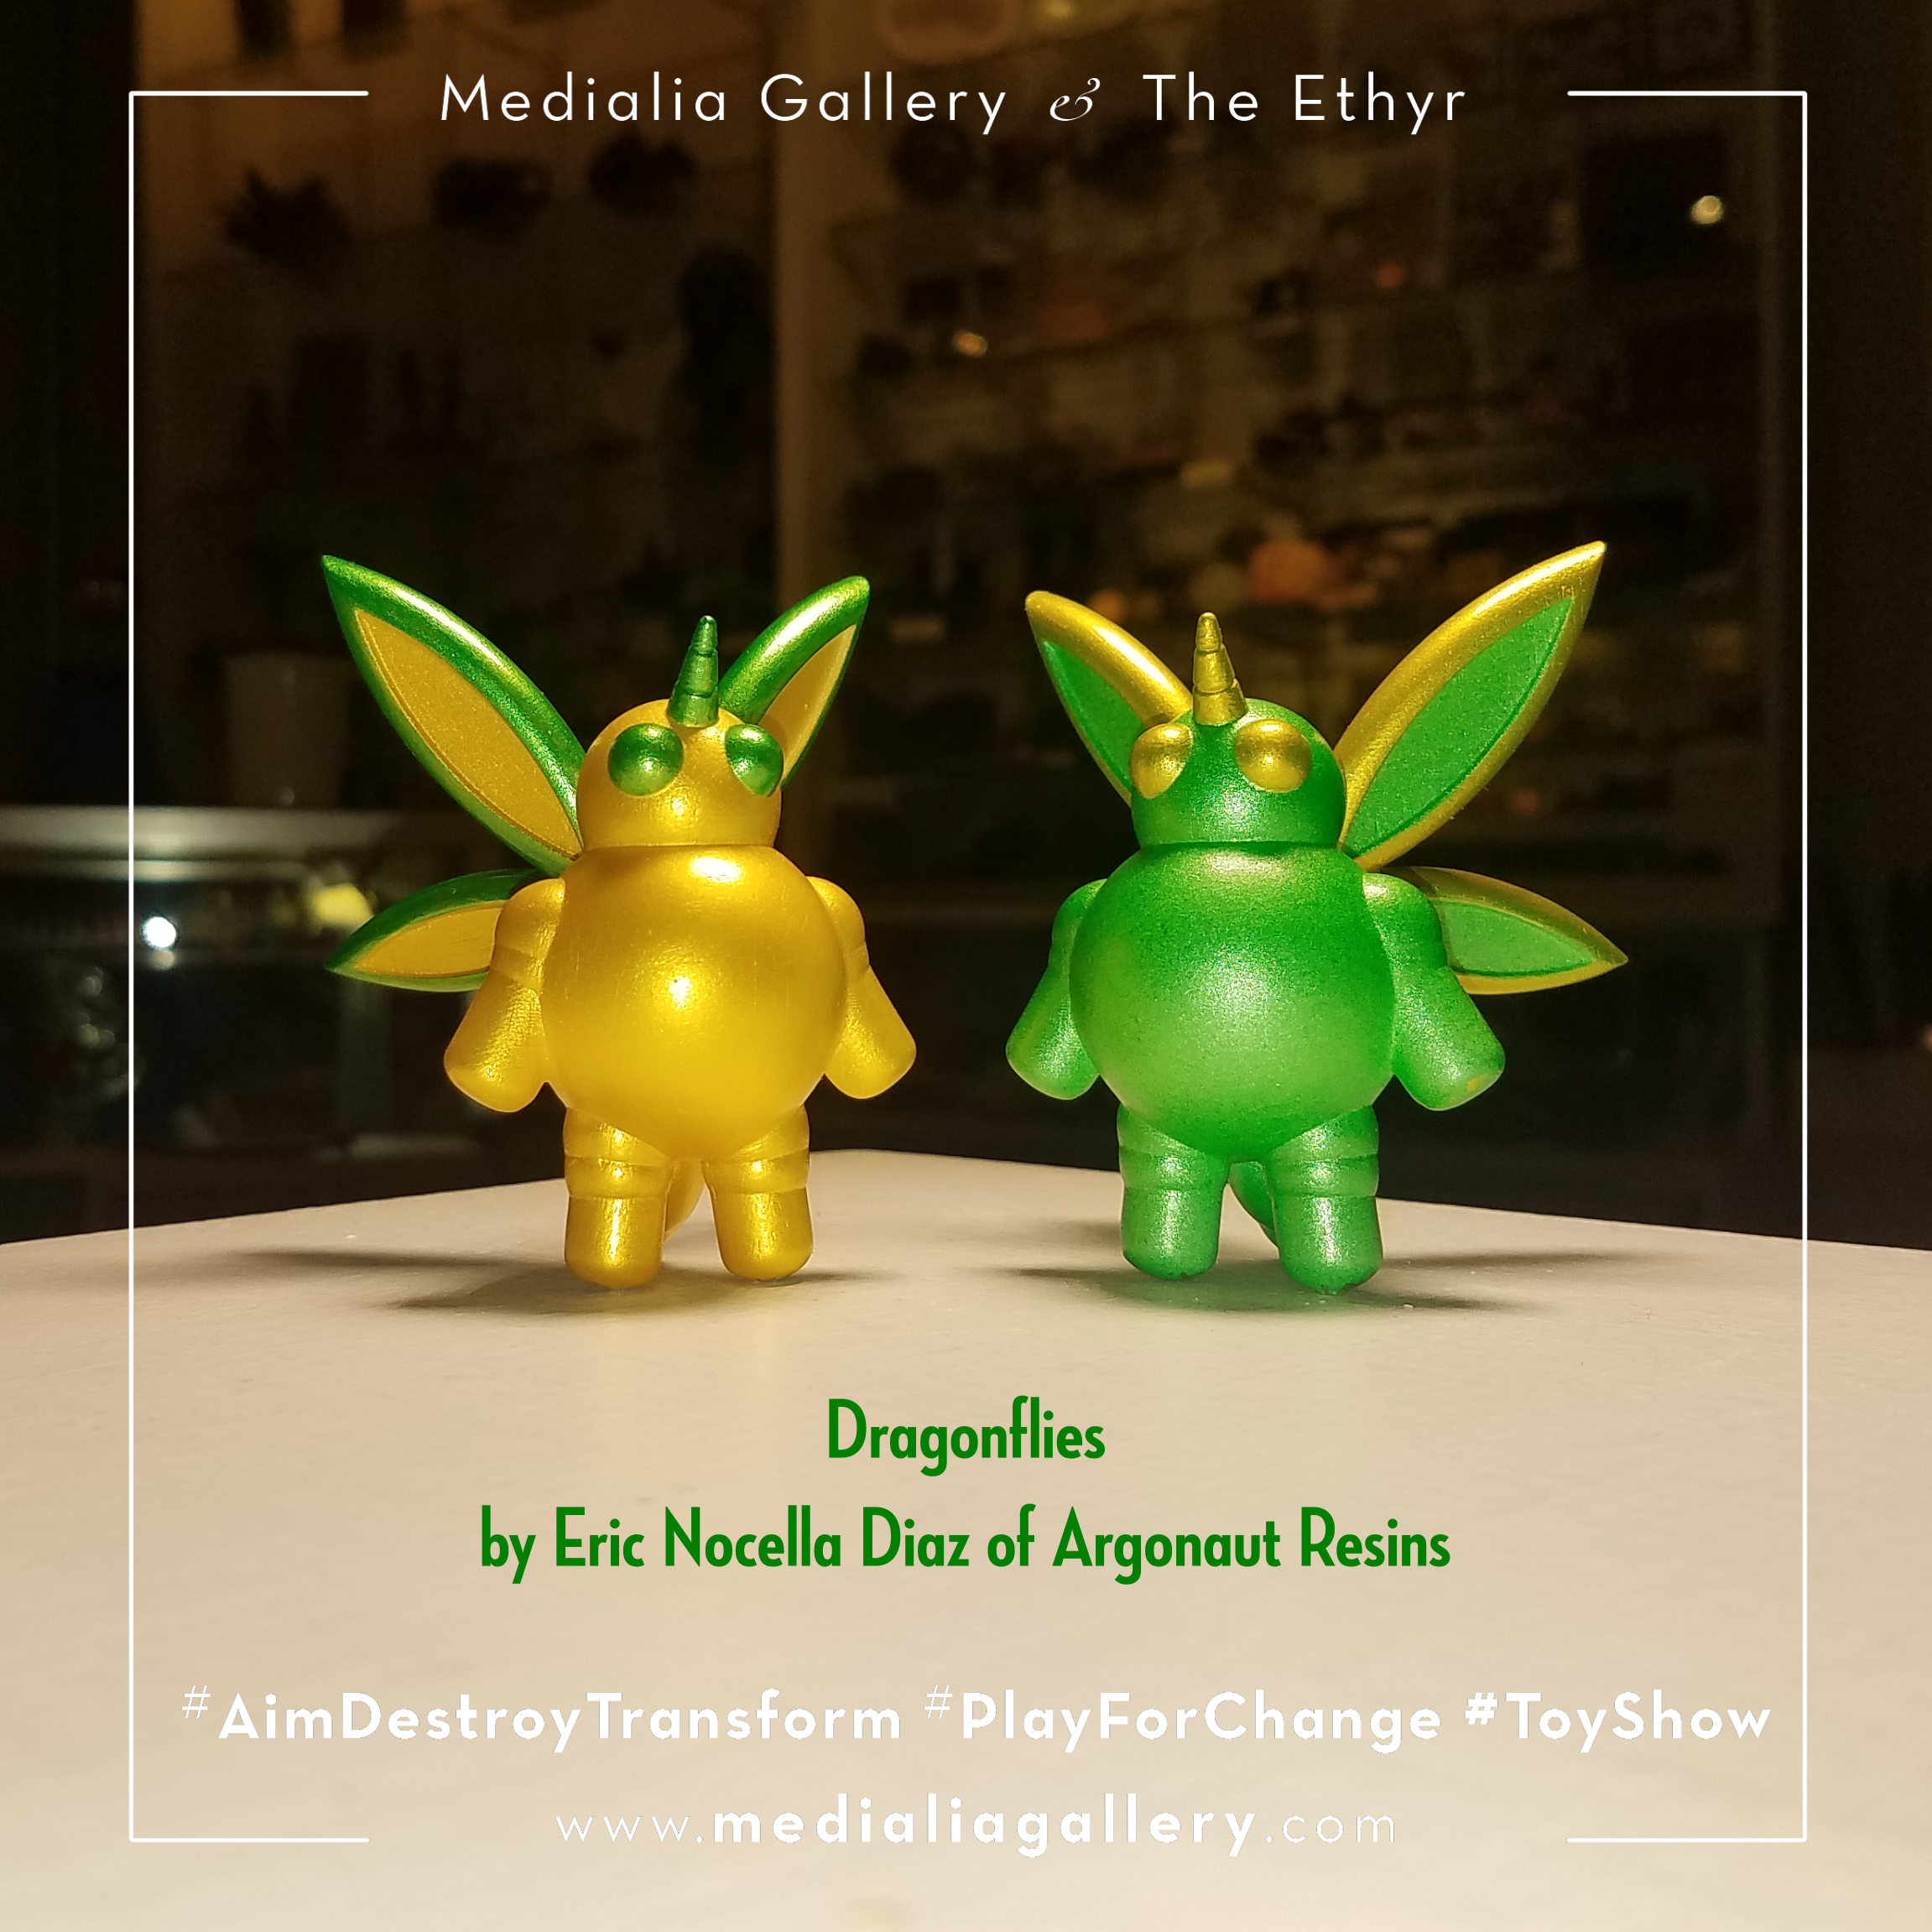 MedialiaGallery_The_Ethyr_AimDestroyTransform_Toy_Show_announcement_Dragonflies_Eric_Nocella_Diaz_Argonaut_Resins_November_2017.jpg.png